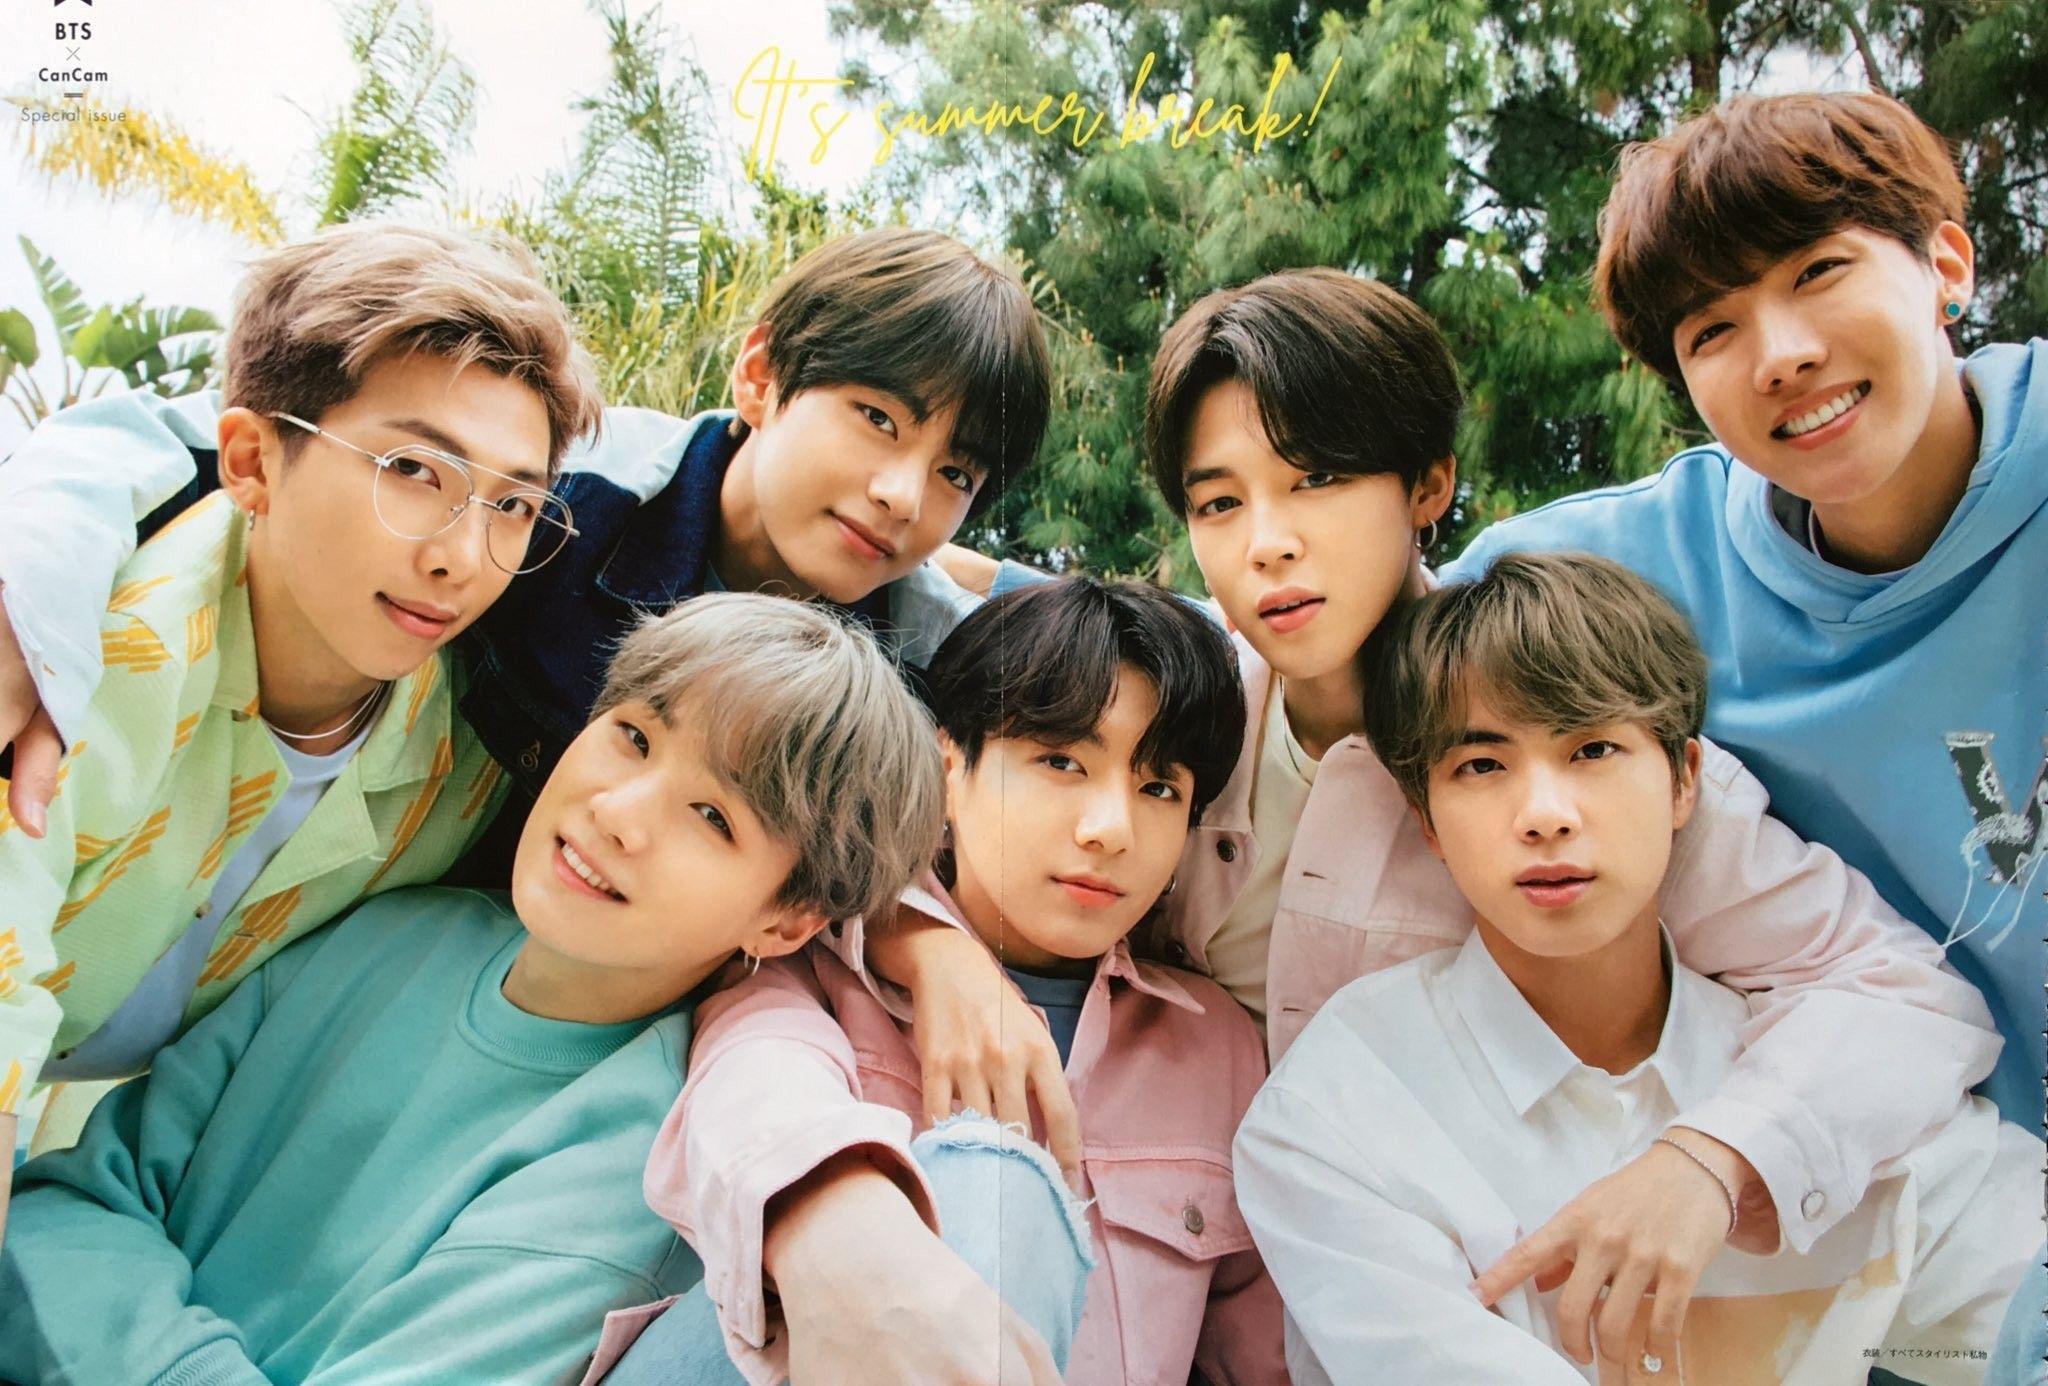 BTS cancam magazine August Issue Bts jungkook